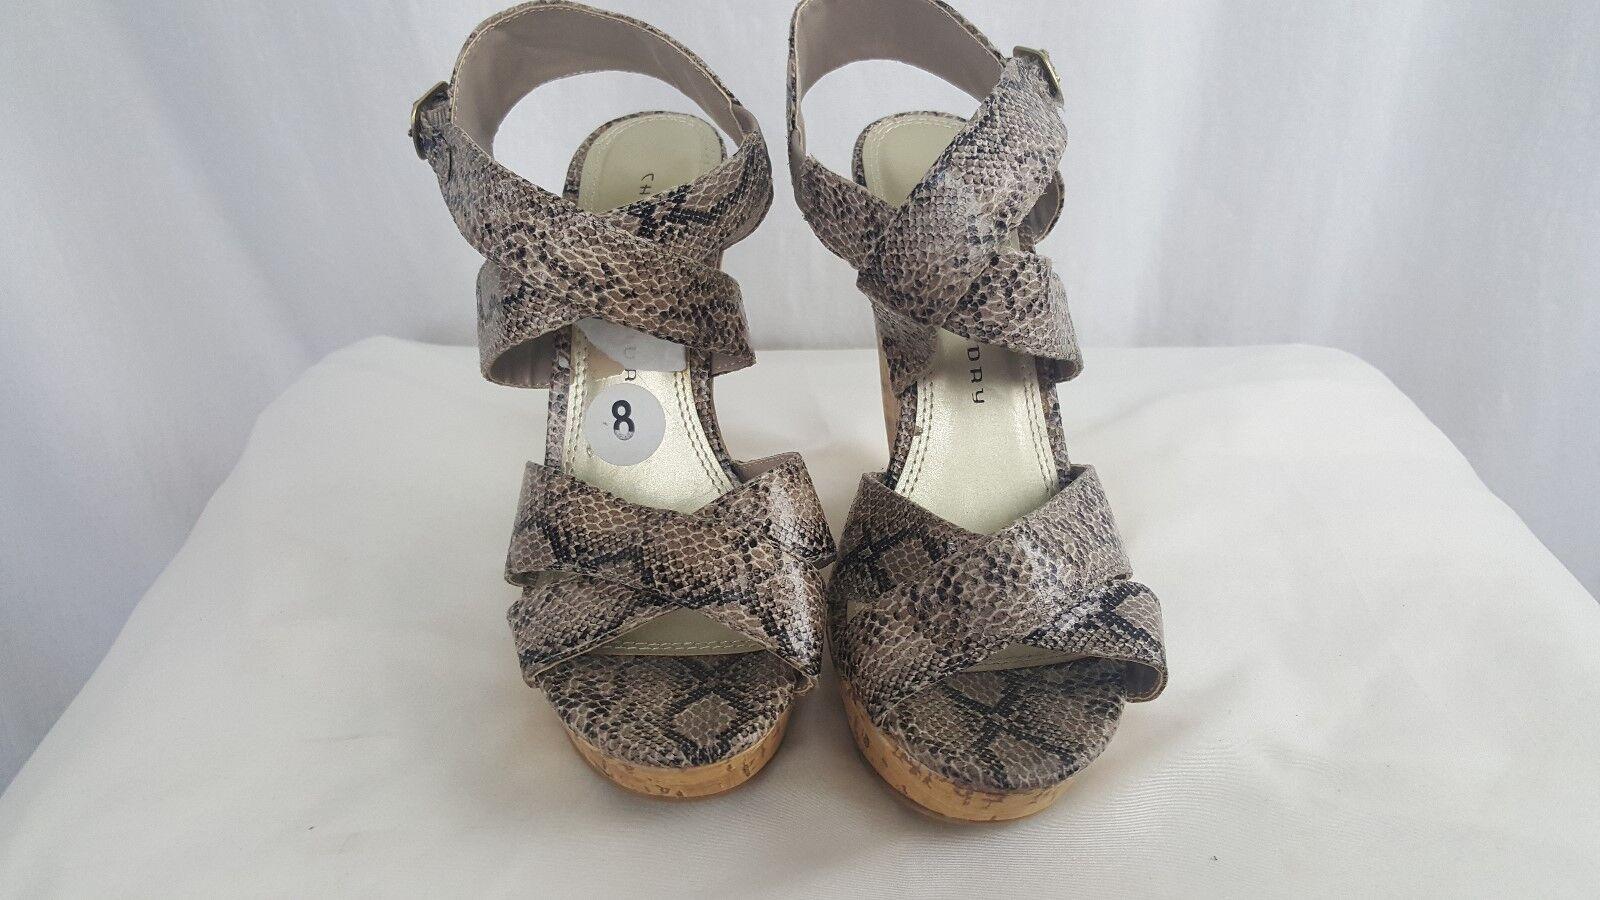 Chinese Heels Laundry Animal Print Corl Heels Chinese Platform Heels size 8 ab9abf